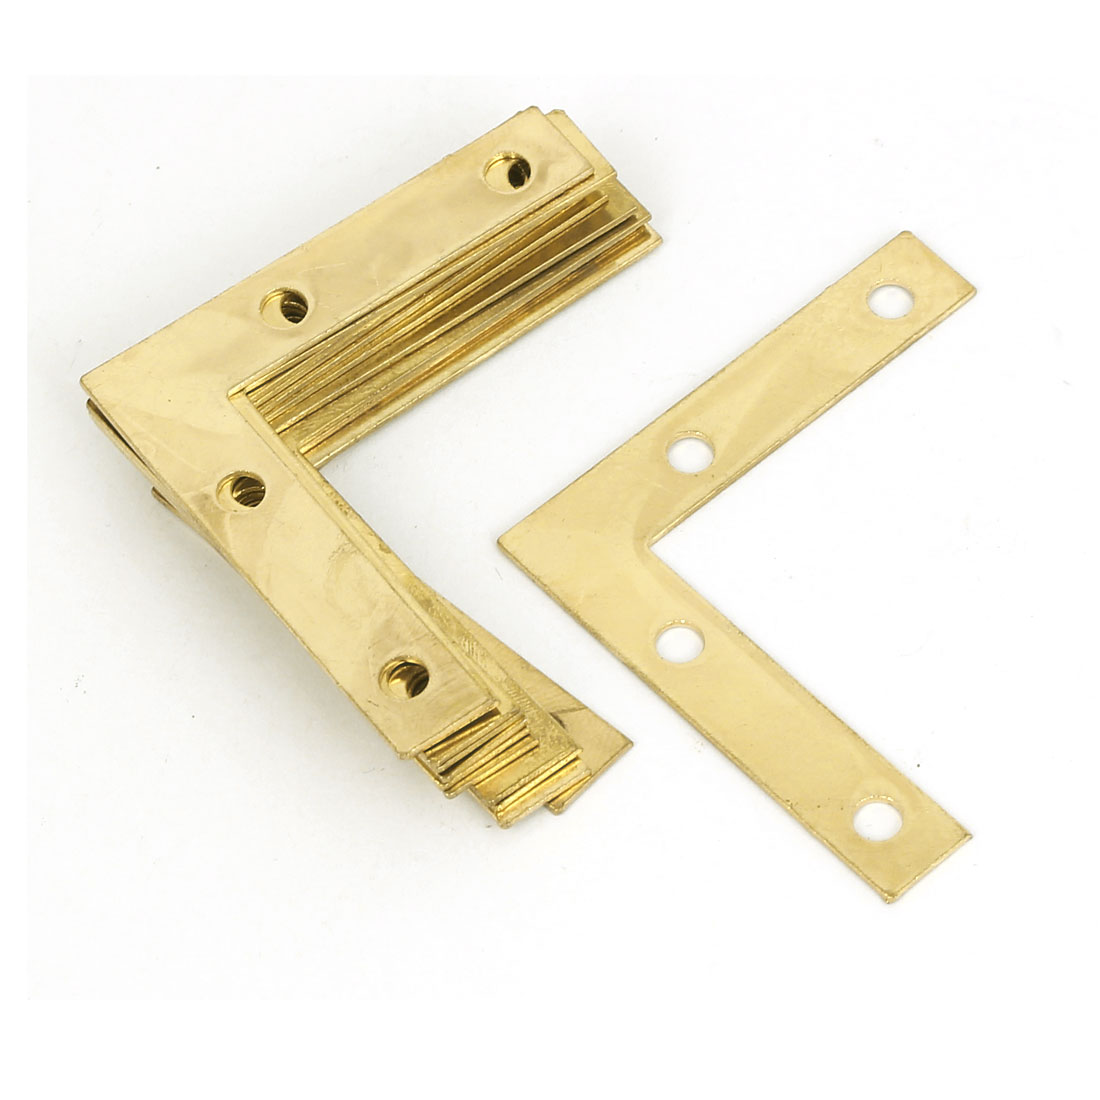 50mm x 50mm Angle Brackets Corner Braces Flat L Shape Repair Plates 12PCS